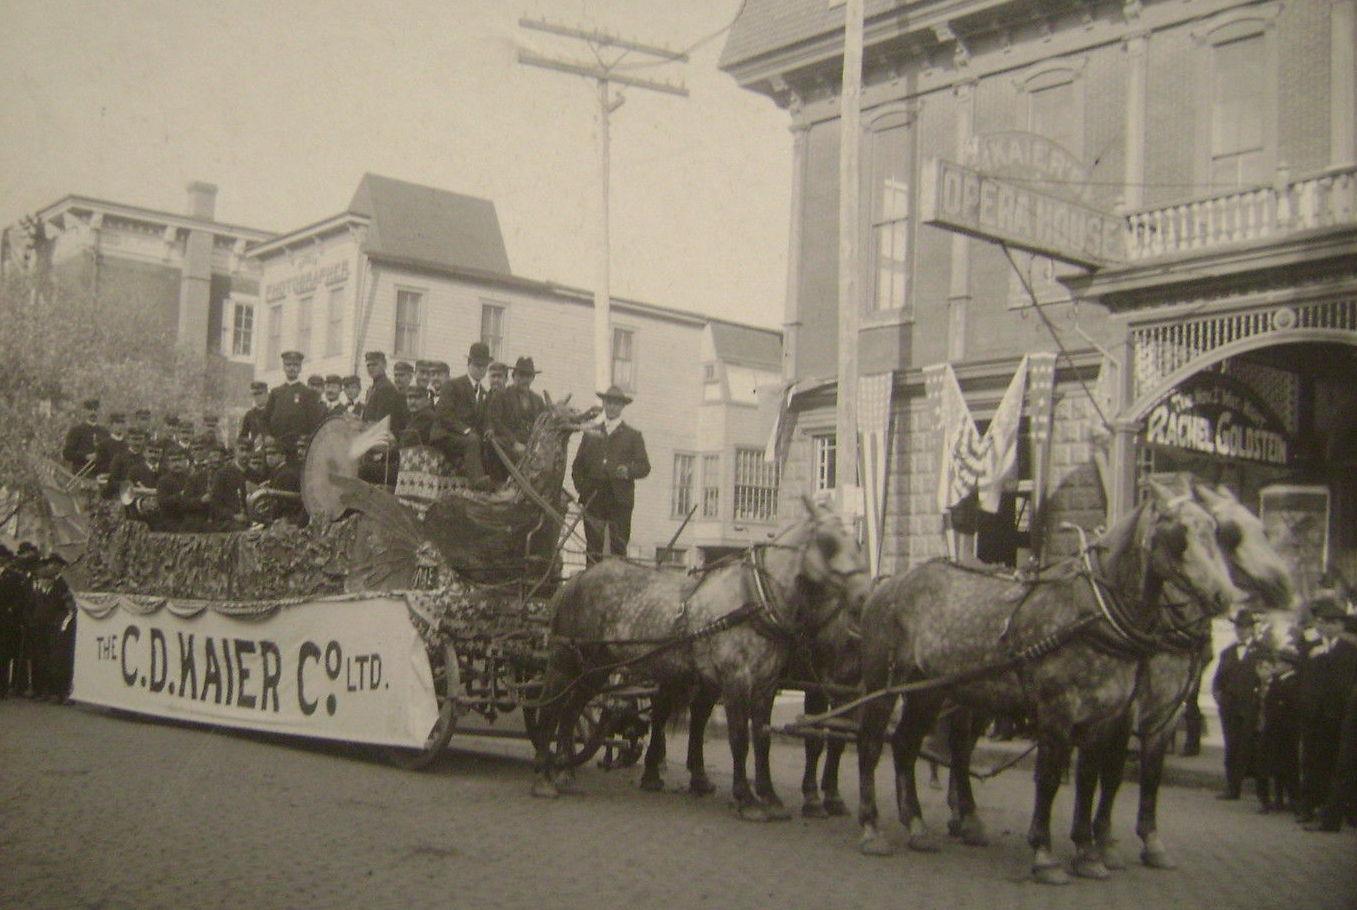 Kaiser's Brewery Parade Wagon